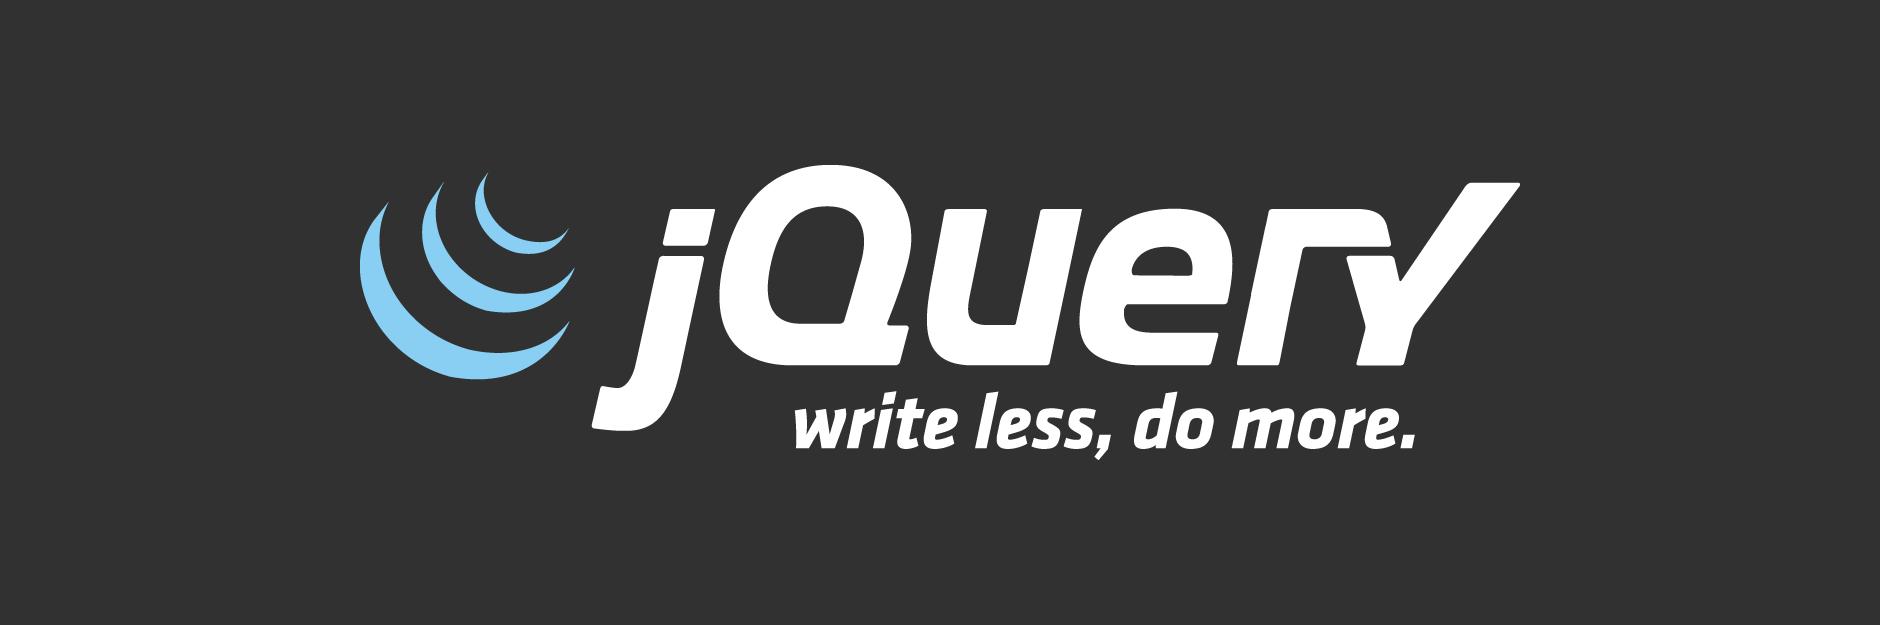 【jQuery】ハンバーガーメニューを作りたい(ページ内リンク版)